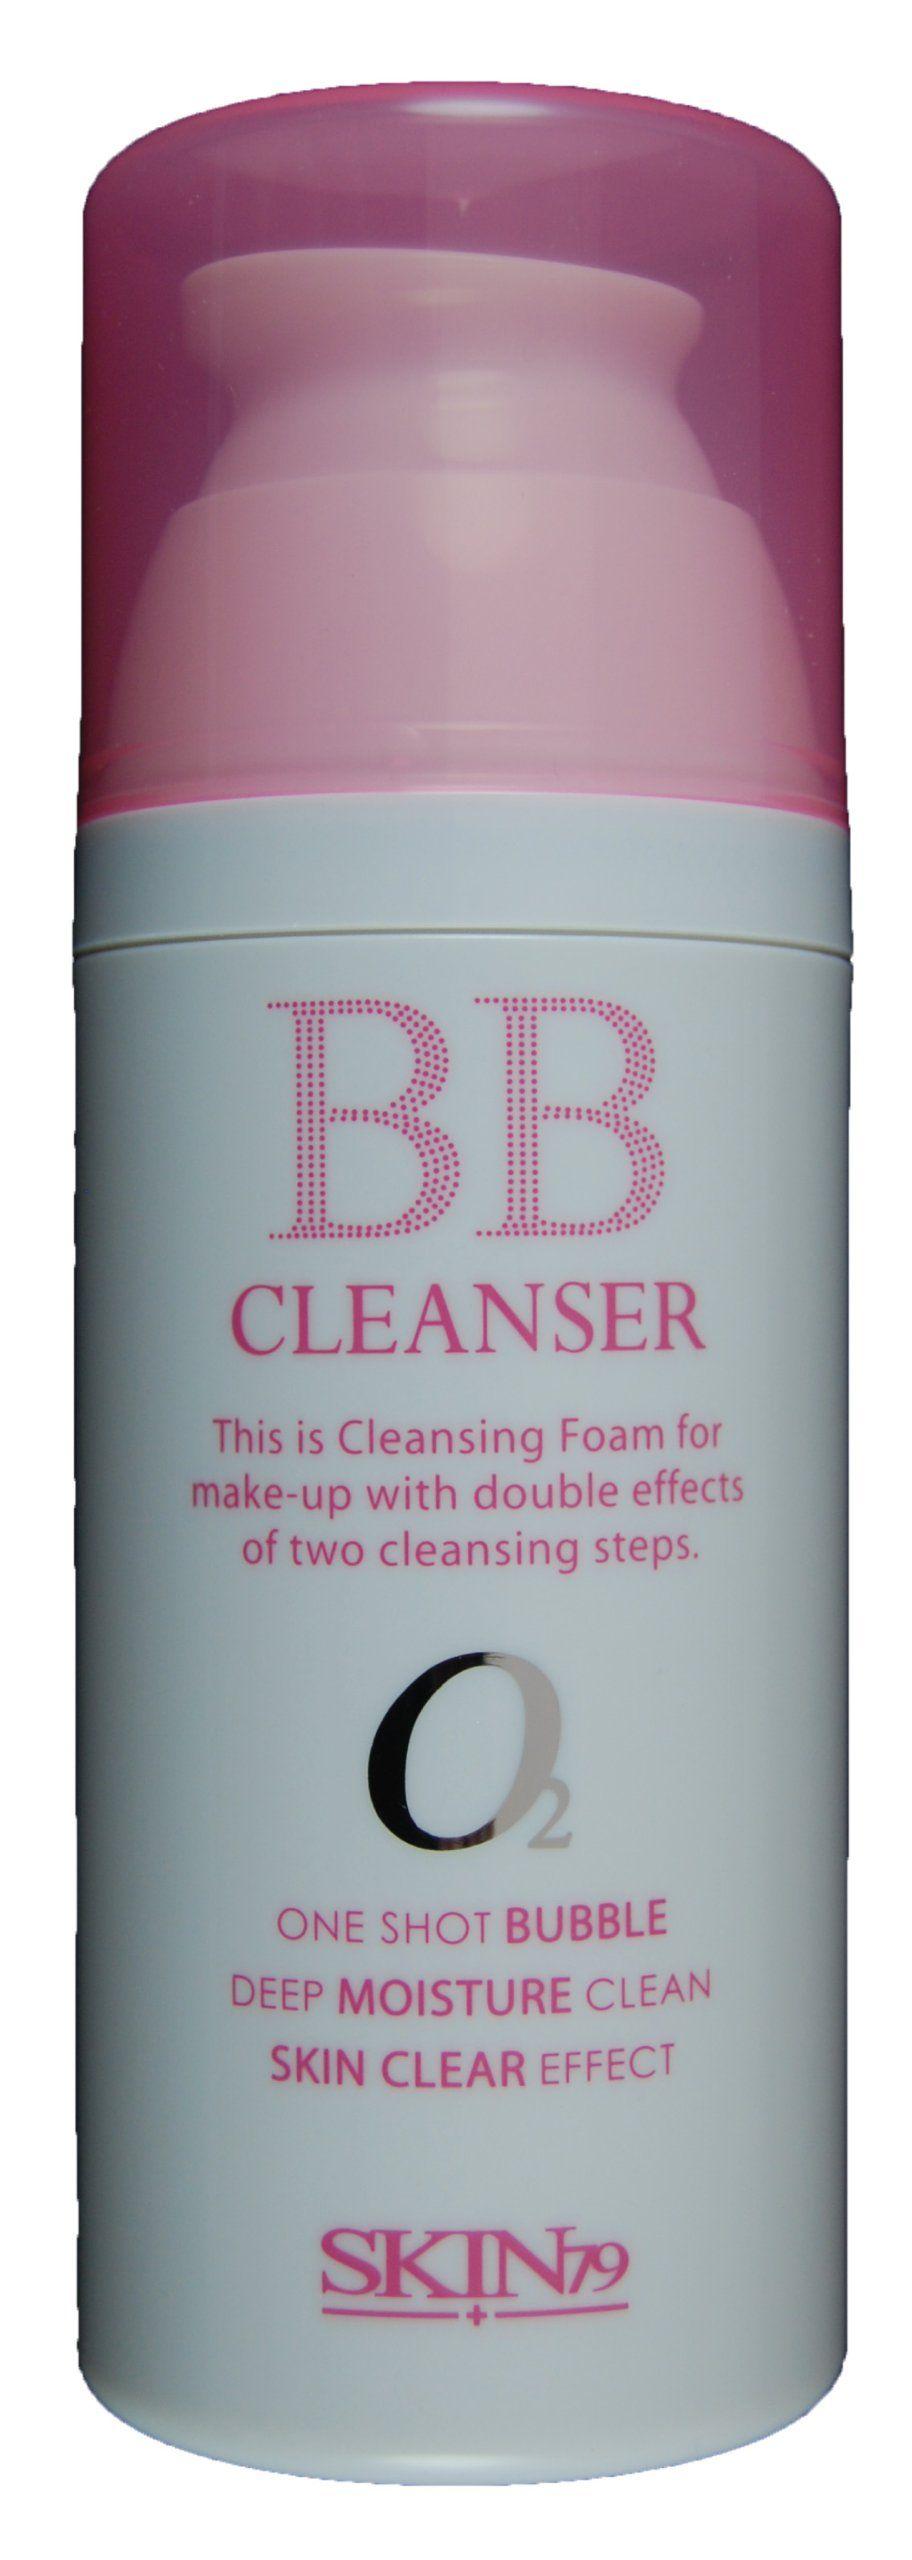 SKIN79 BB CLEANSER WITH SKIN DETOX EFFECT 100ml. ONE SHOT BUBBLE / DEEP MOISTURE CLEAN / SKIN CLEAR EFFECT. 100% GENUINE GUARANTEED.